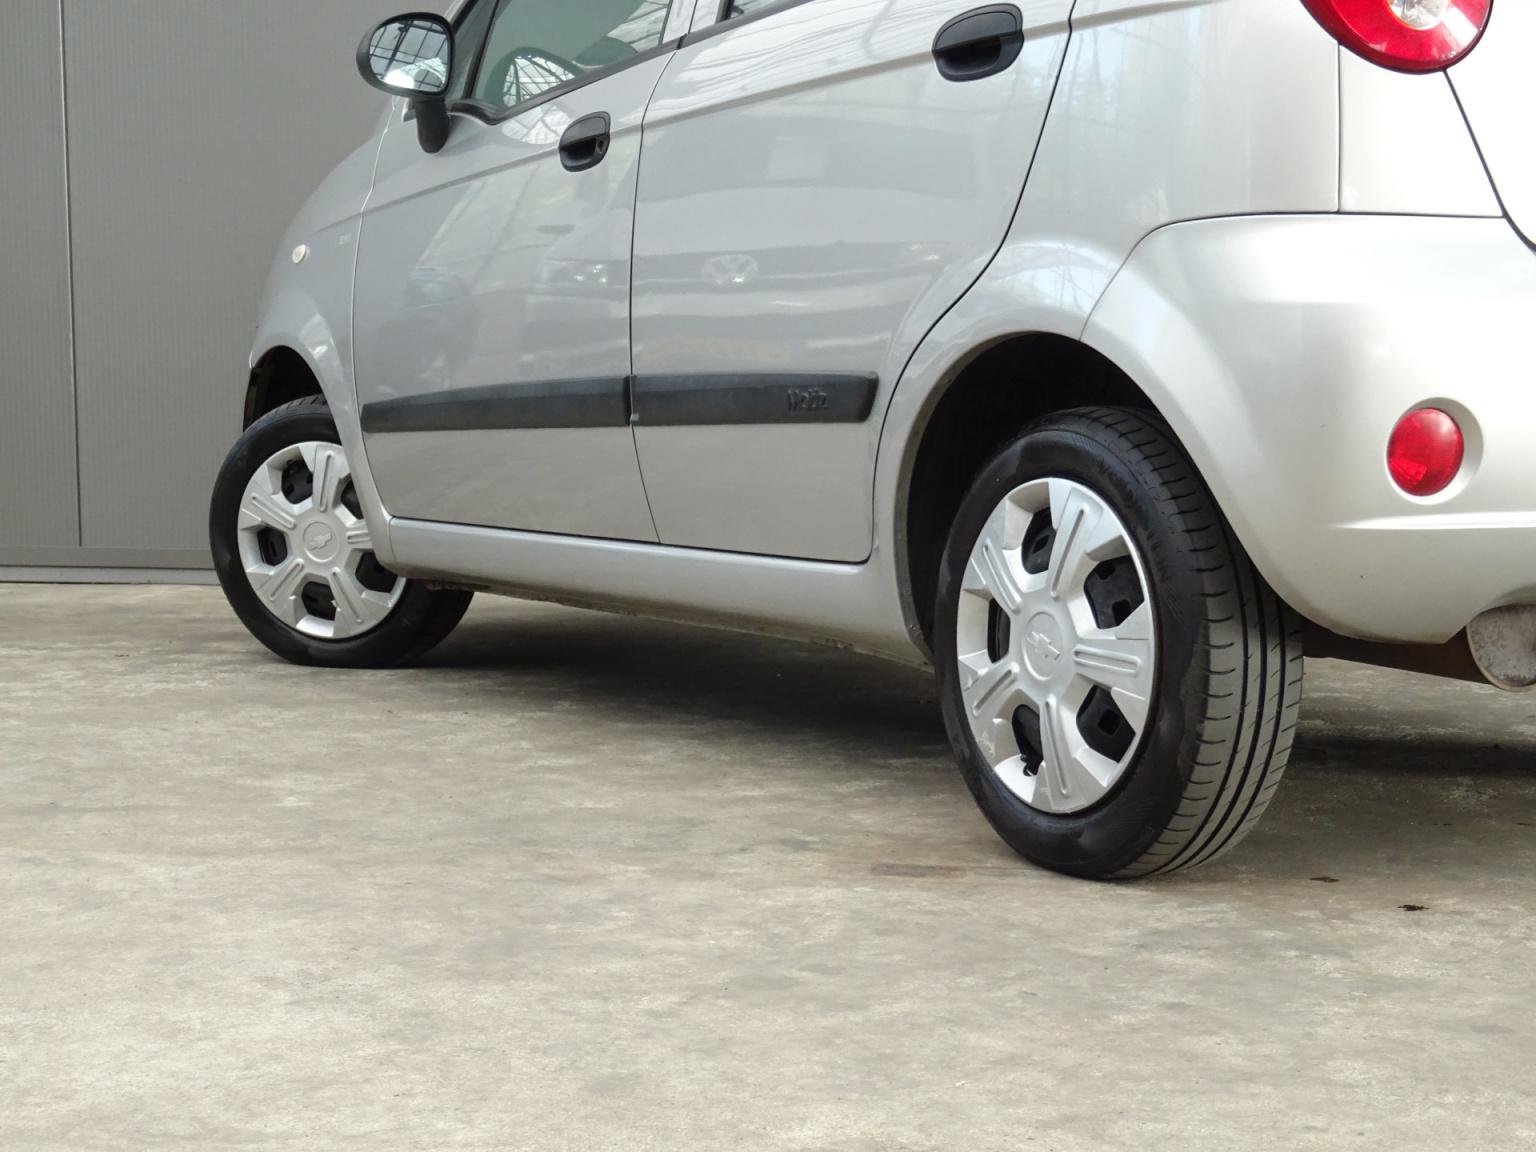 Chevrolet-Matiz-26